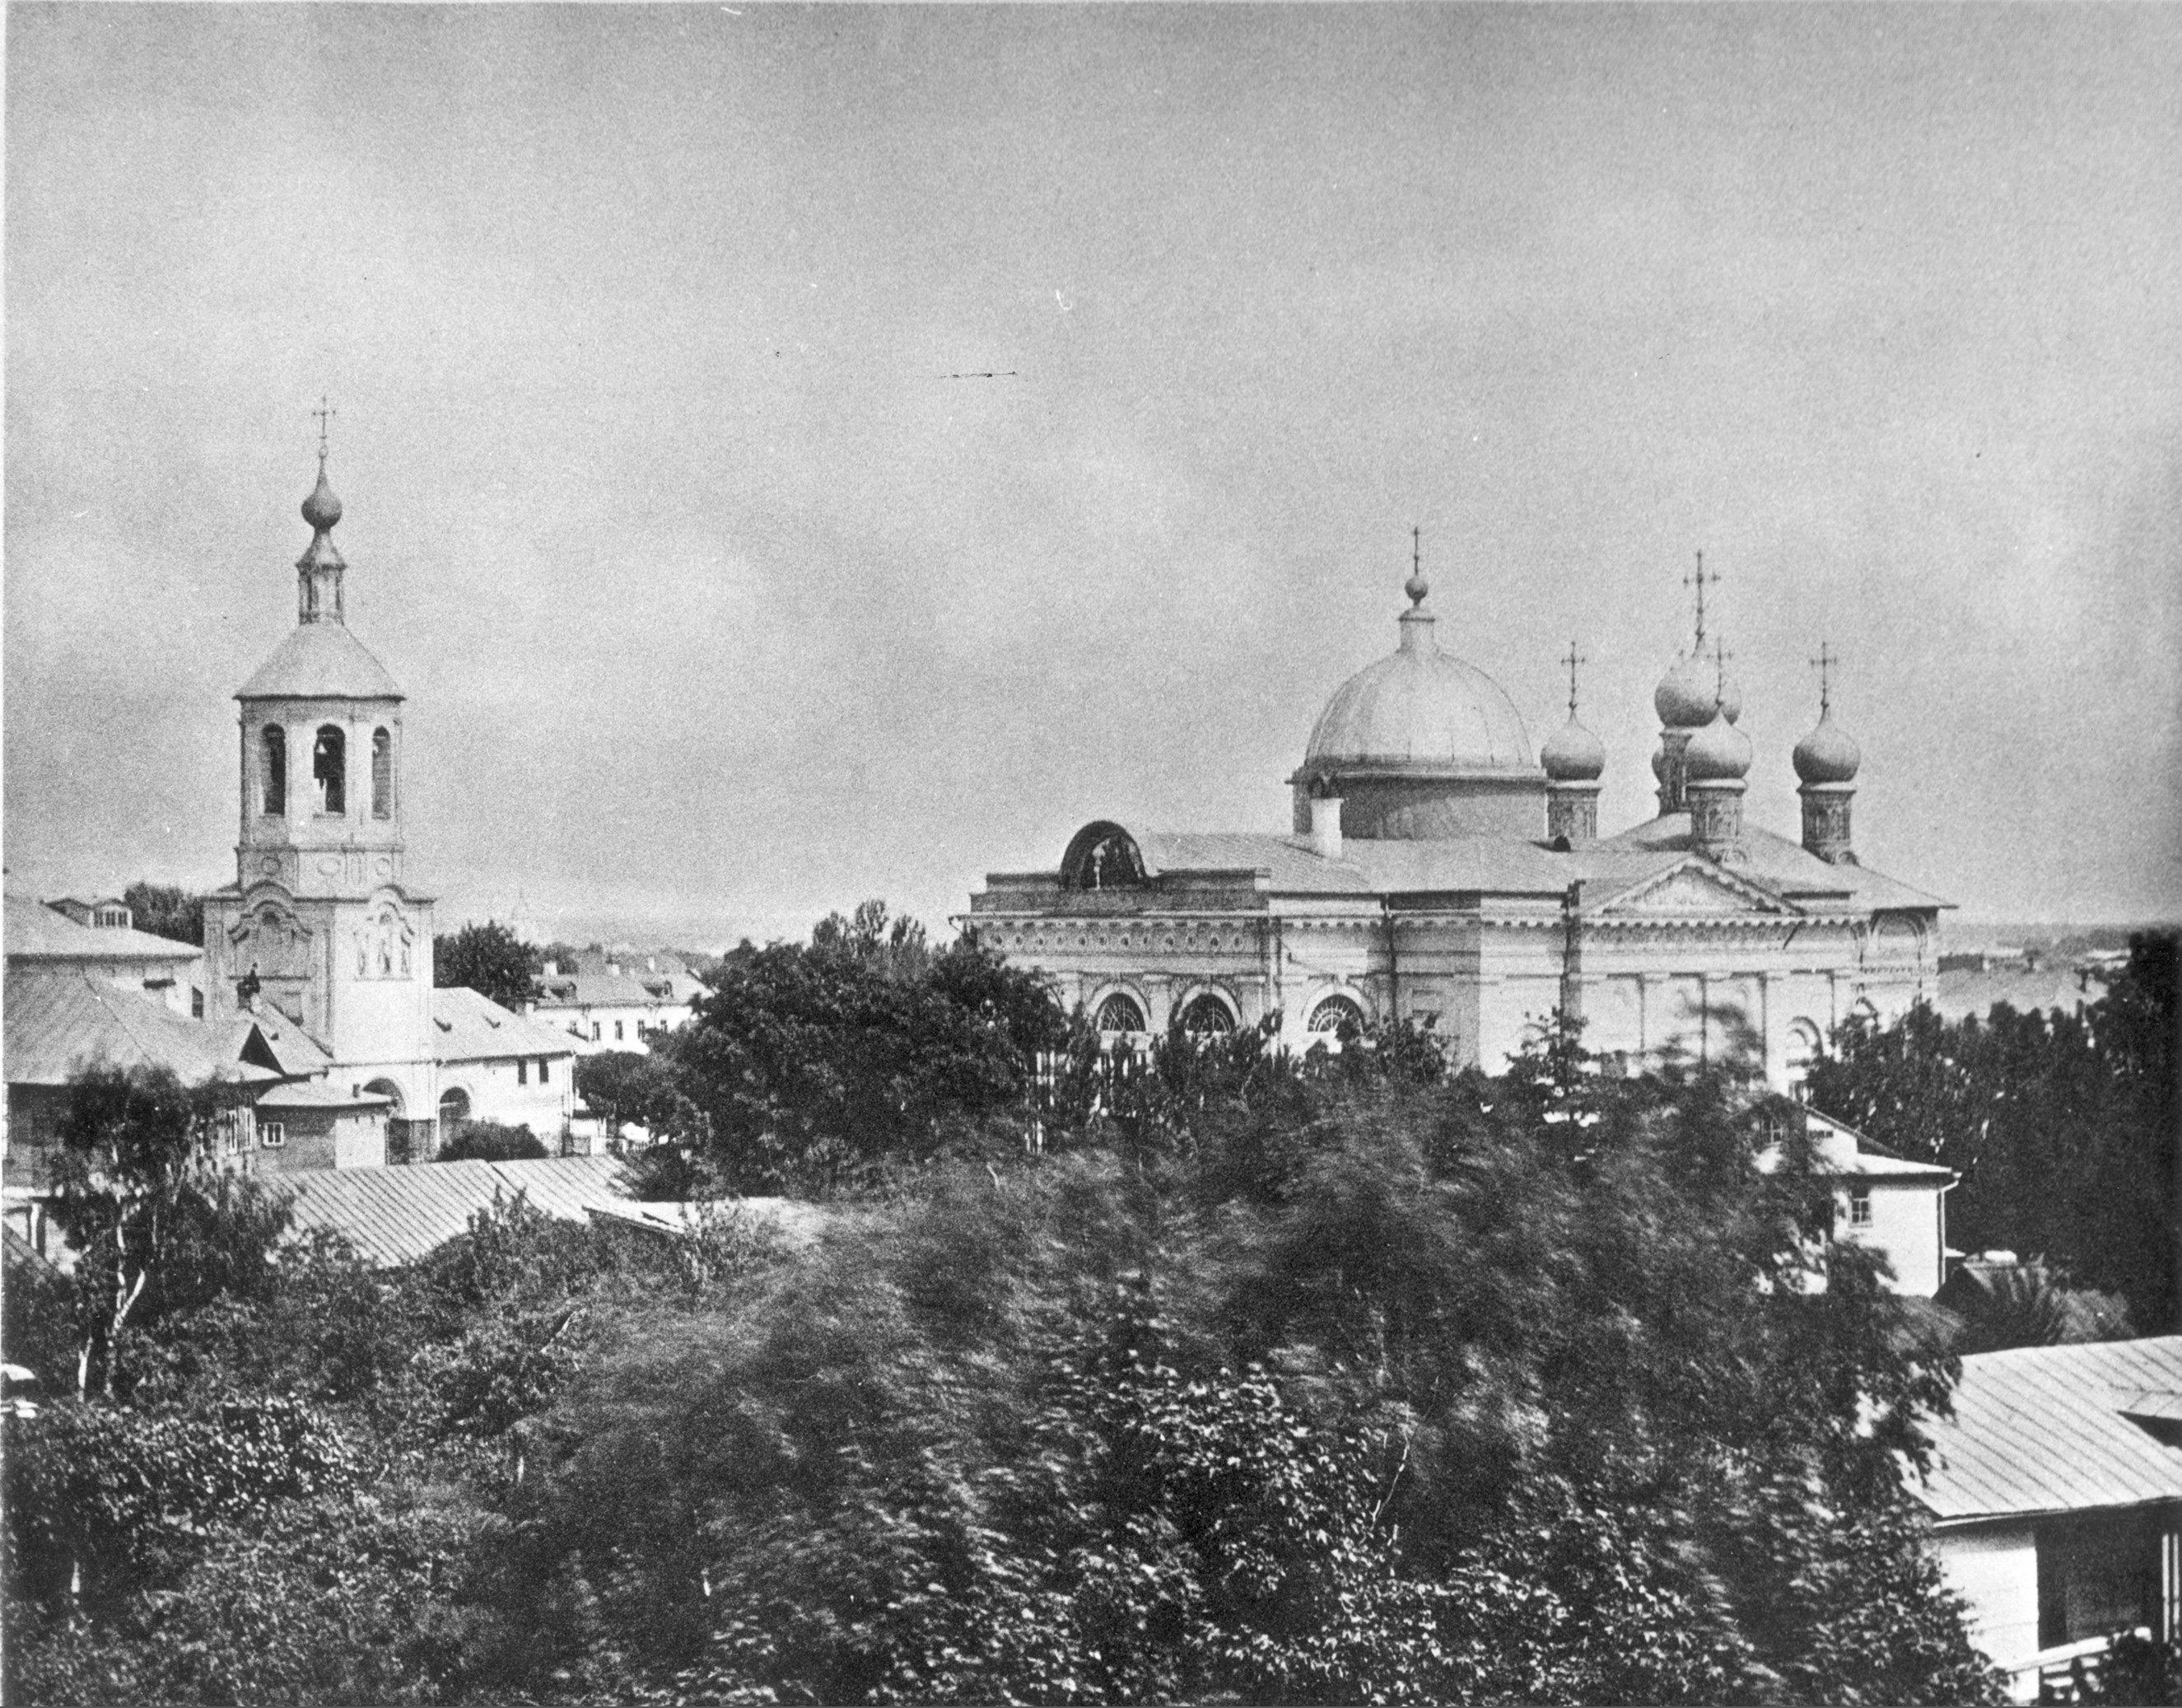 1875. Воронцово поле. Храм Илии Пророка